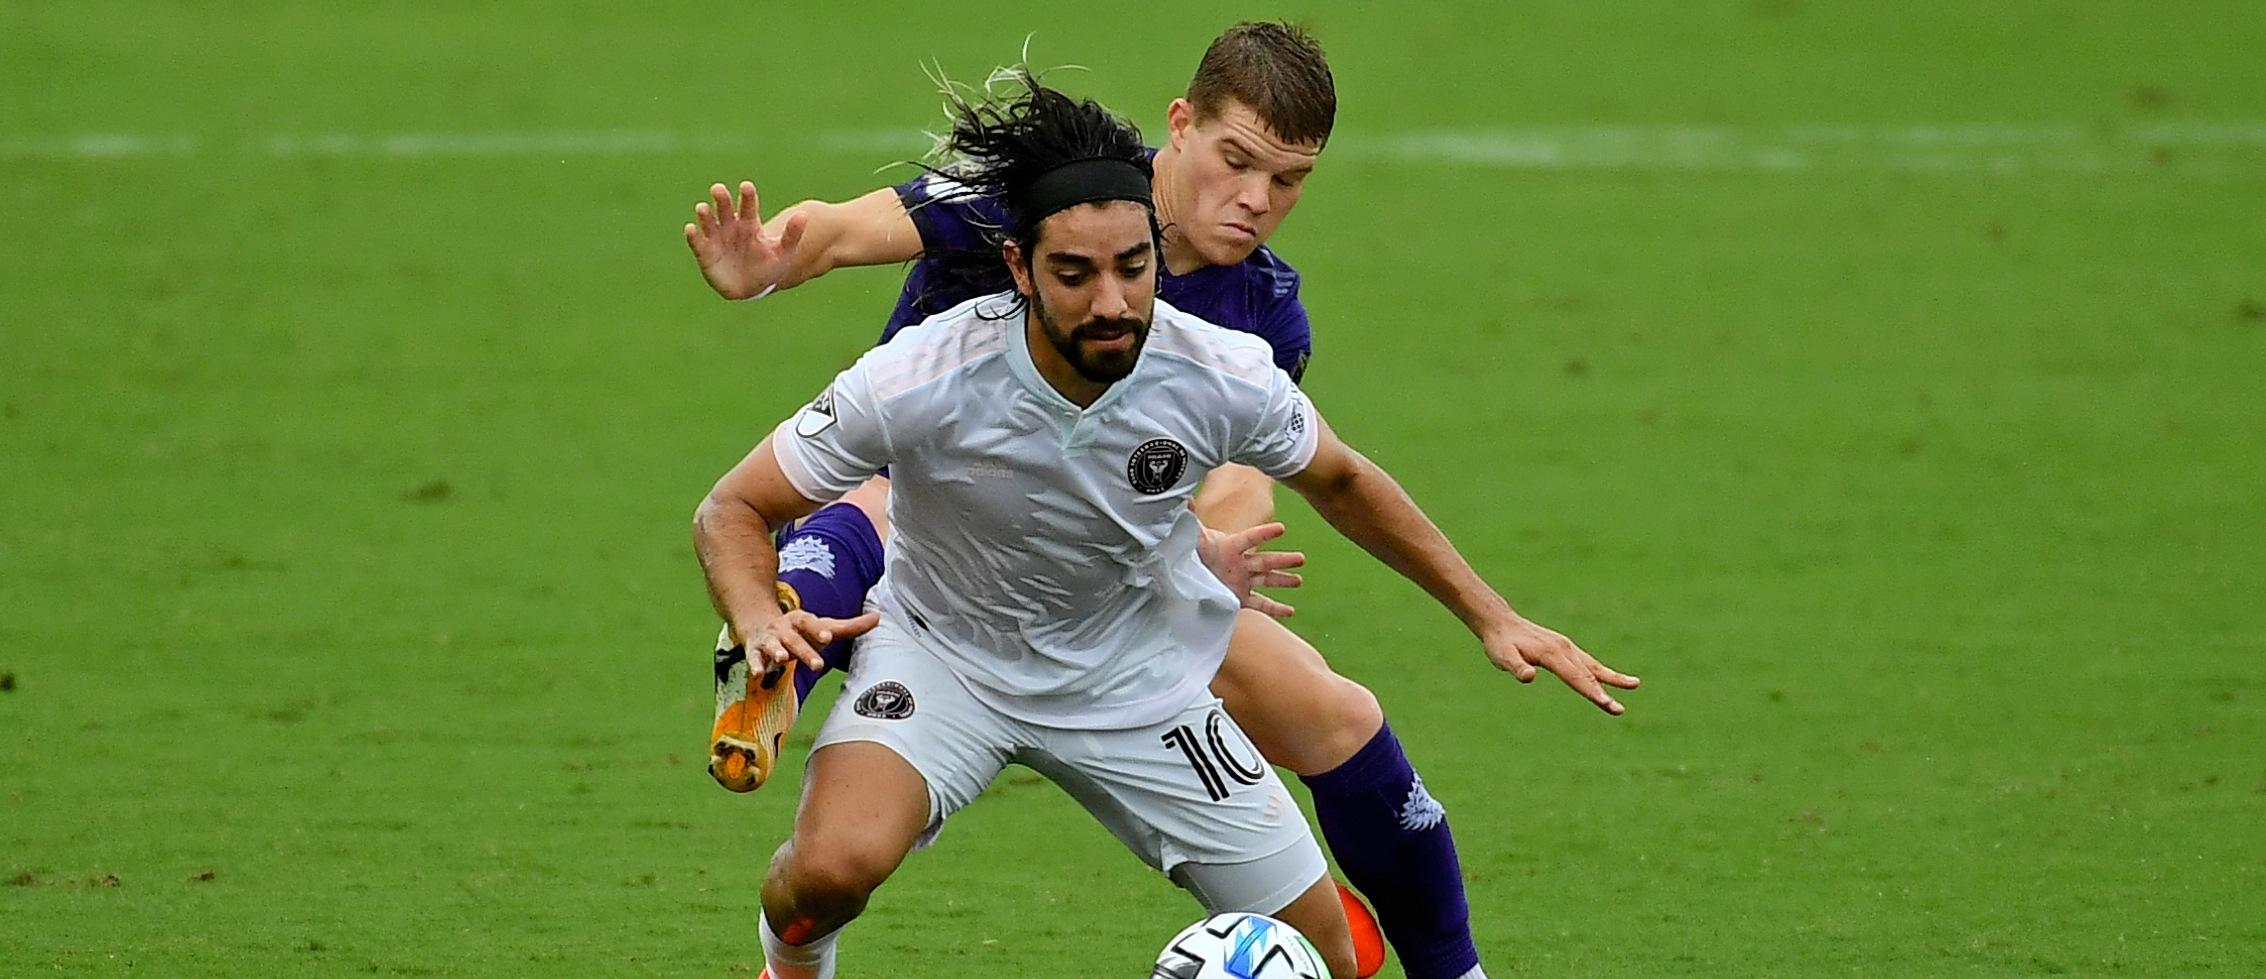 Inter Miami CF 2, Orlando City SC 1   2020 MLS Match Recap   MLSSoccer.com